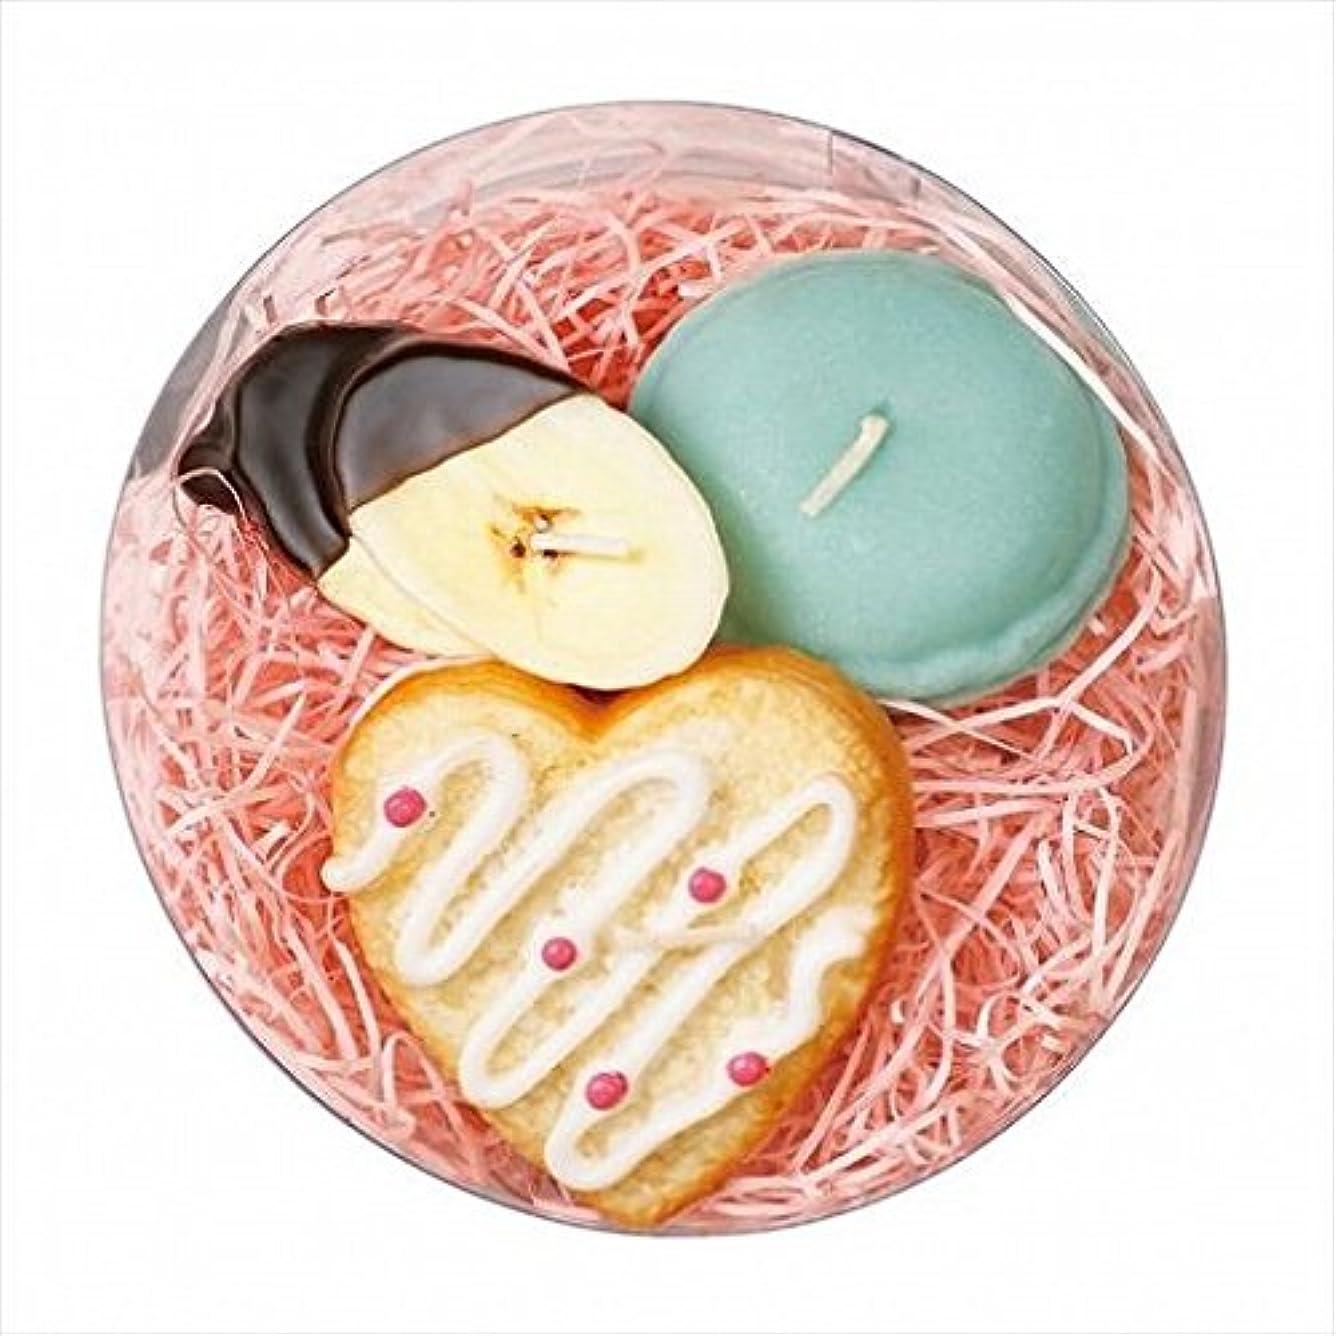 sweets candle(スイーツキャンドル) プチスイーツキャンドルセット 「 シュガーハート 」 キャンドル 100x100x55mm (A6366050)